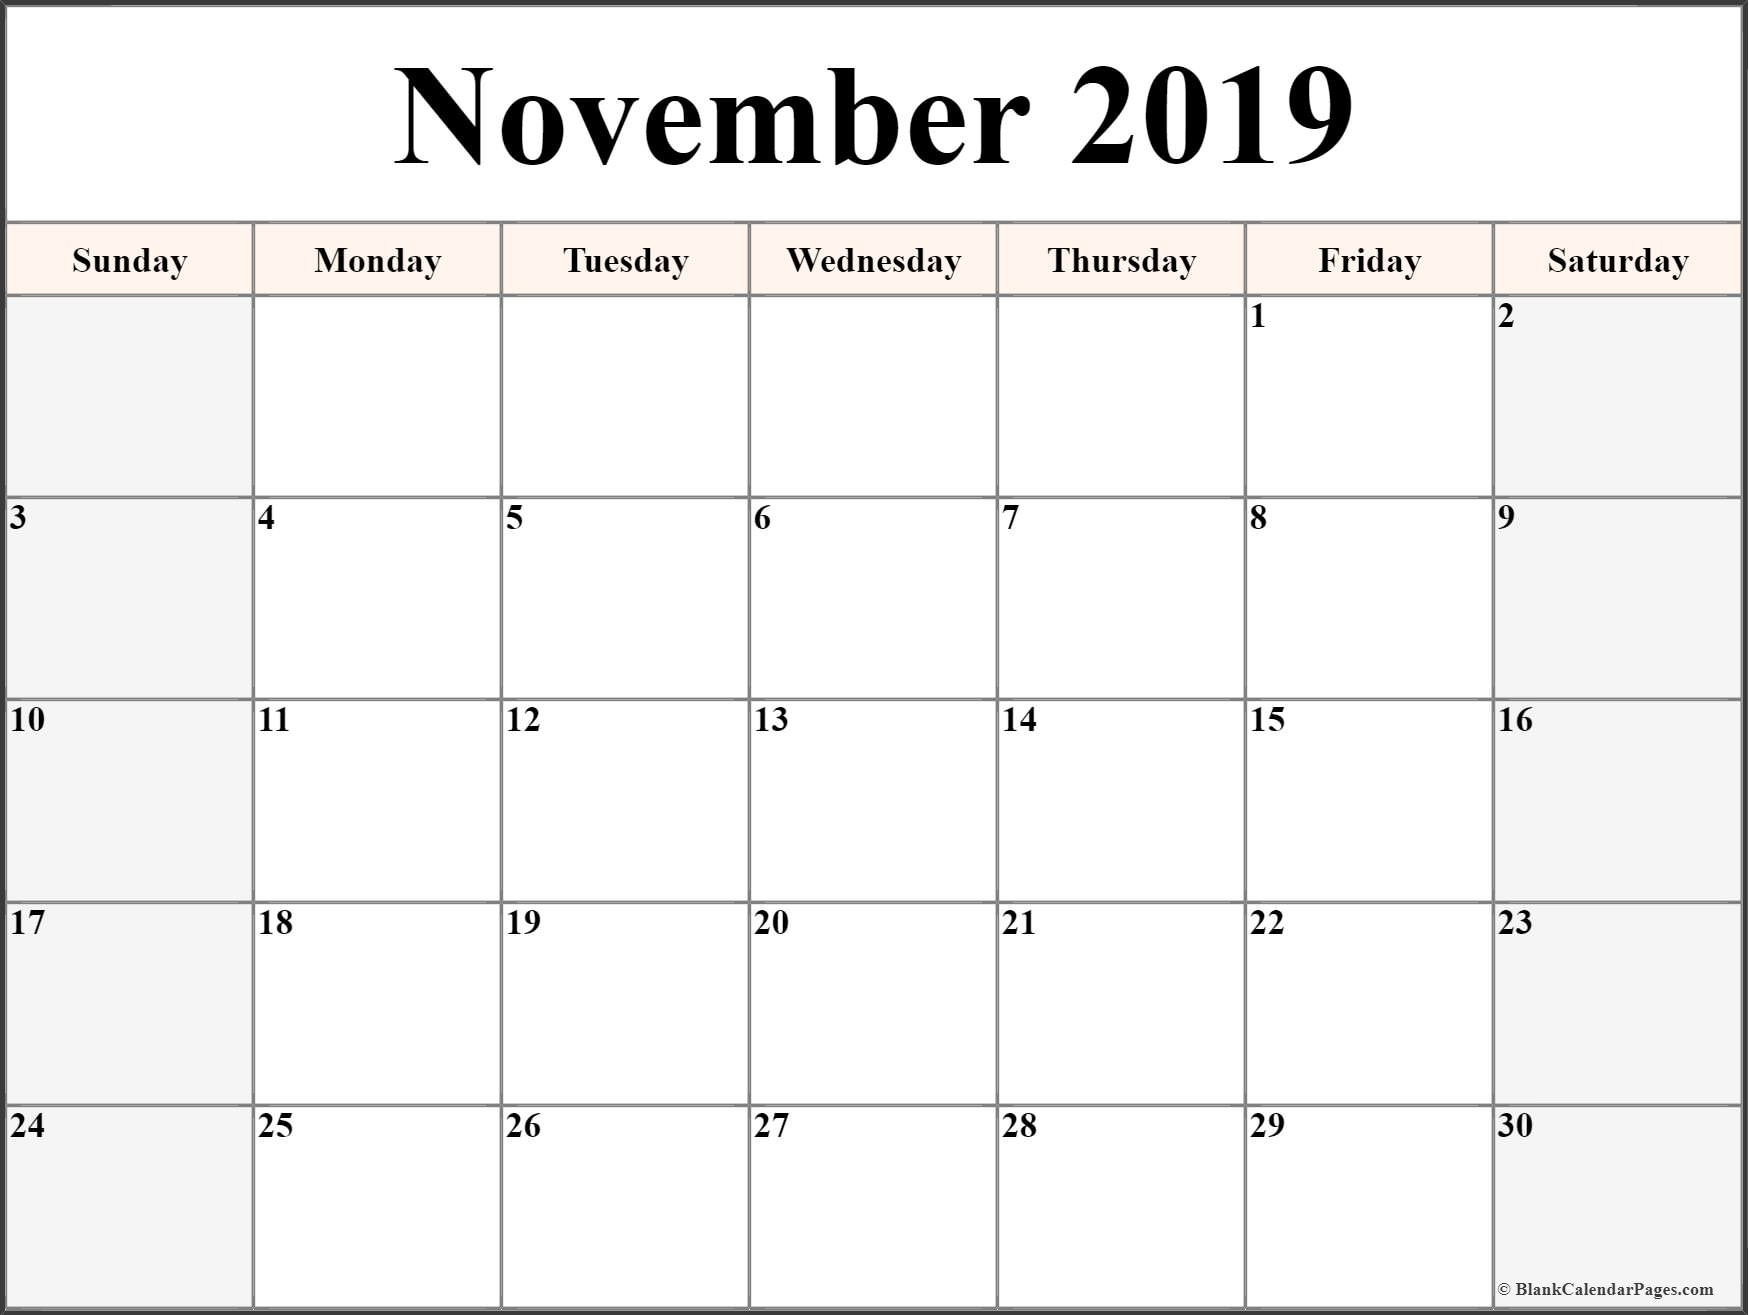 November 2019 Calendar | Free Printable Monthly Calendars